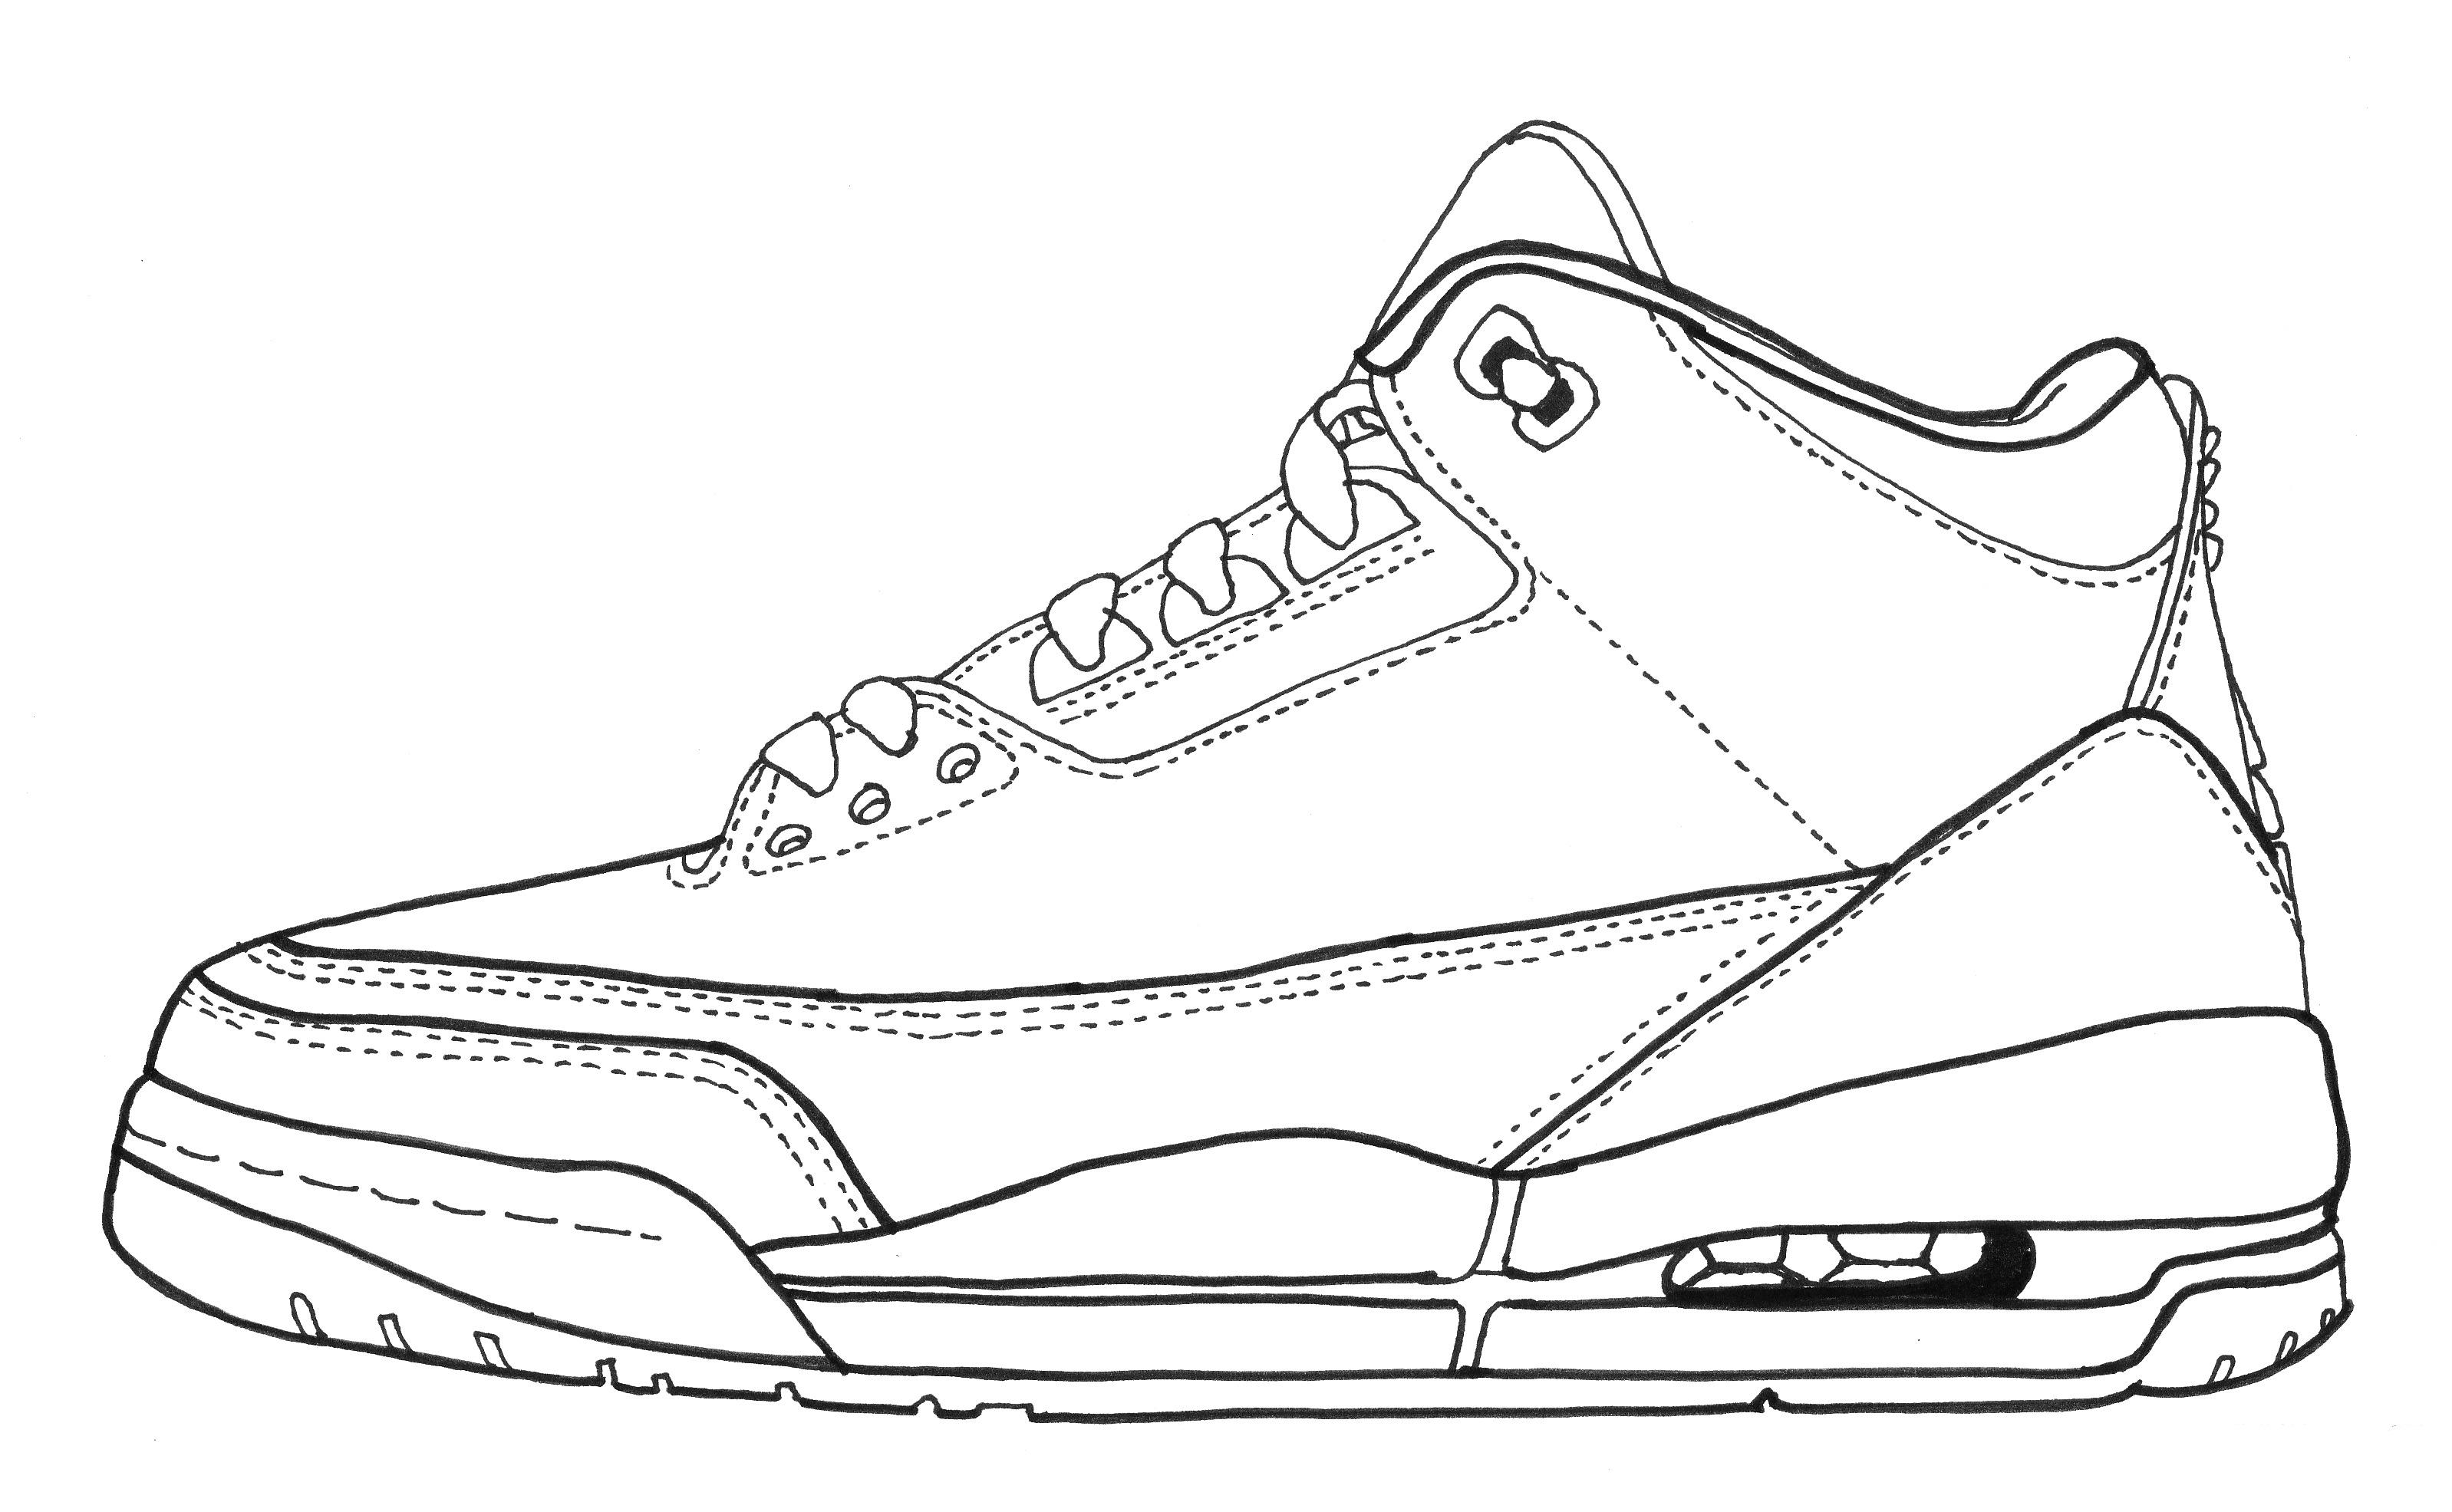 Nike Air Mag Drawing At Getdrawings